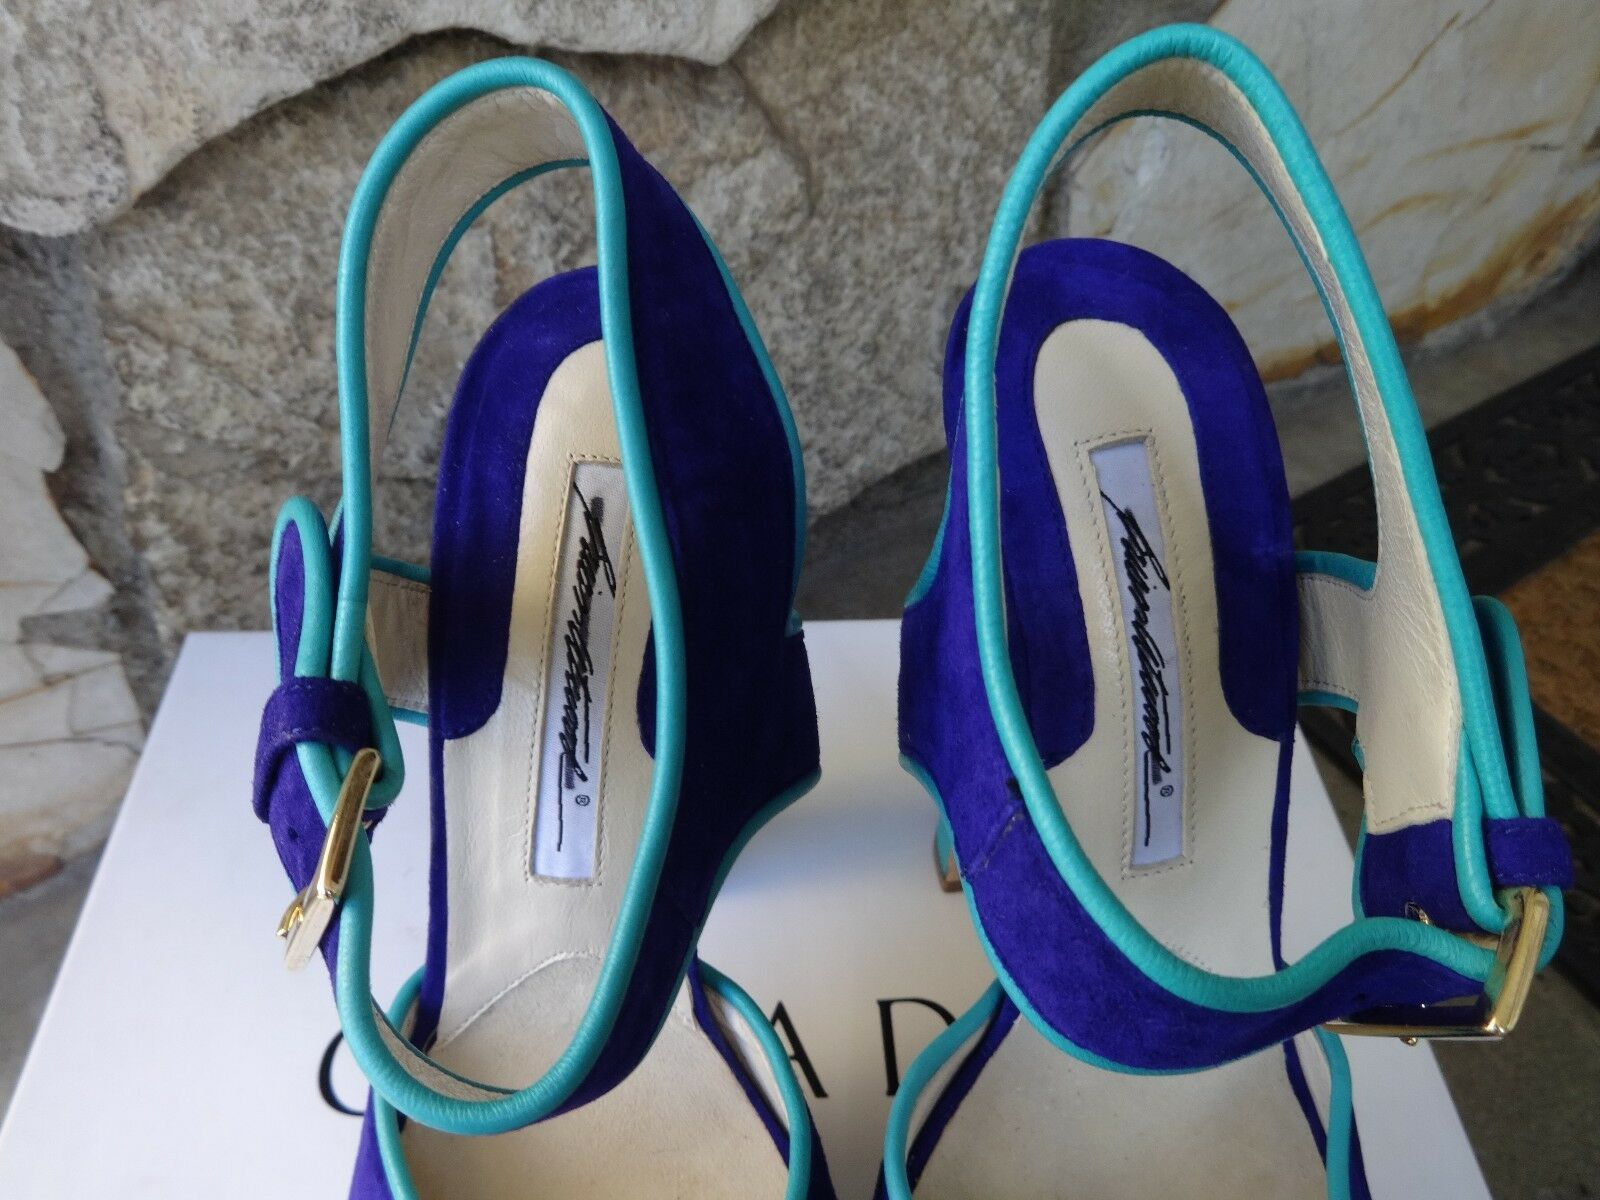 Brian Atwood  Karin  SkyHigh Platform Sandal Sandal Sandal Suede  EU Size 38.5 291d08